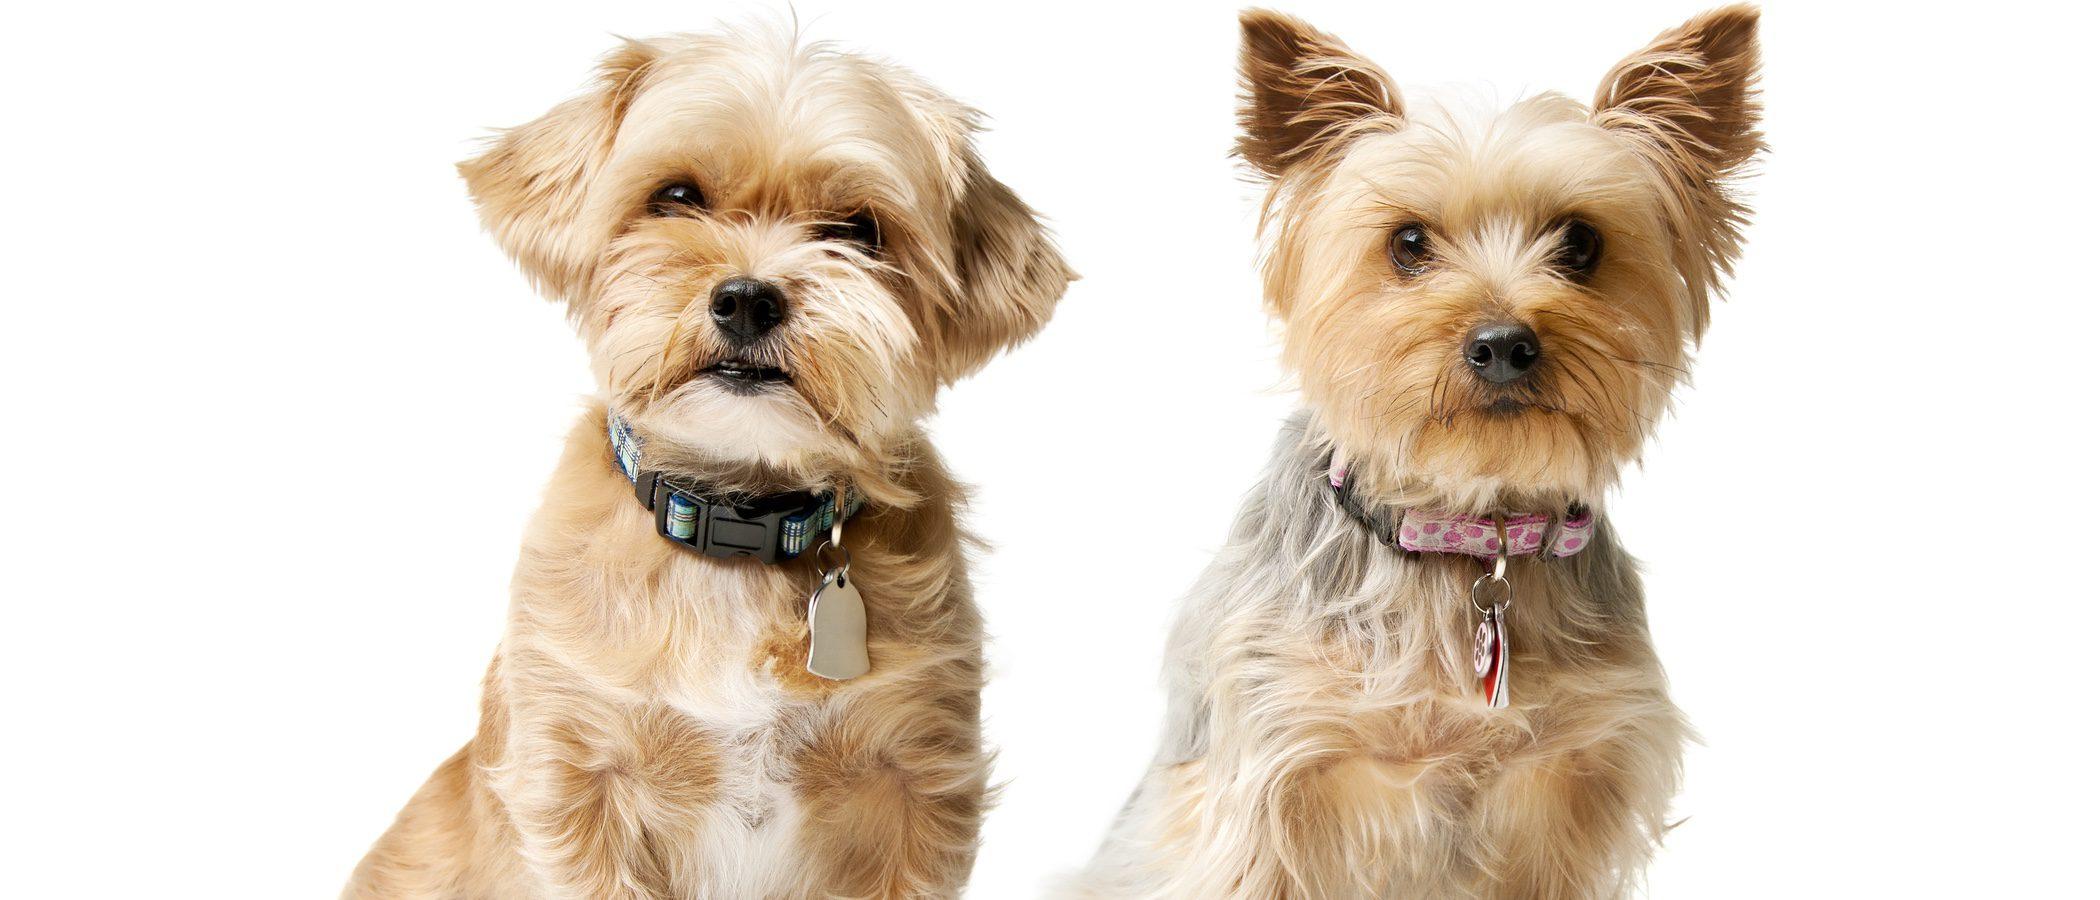 Razas de perros: Silky Terrier